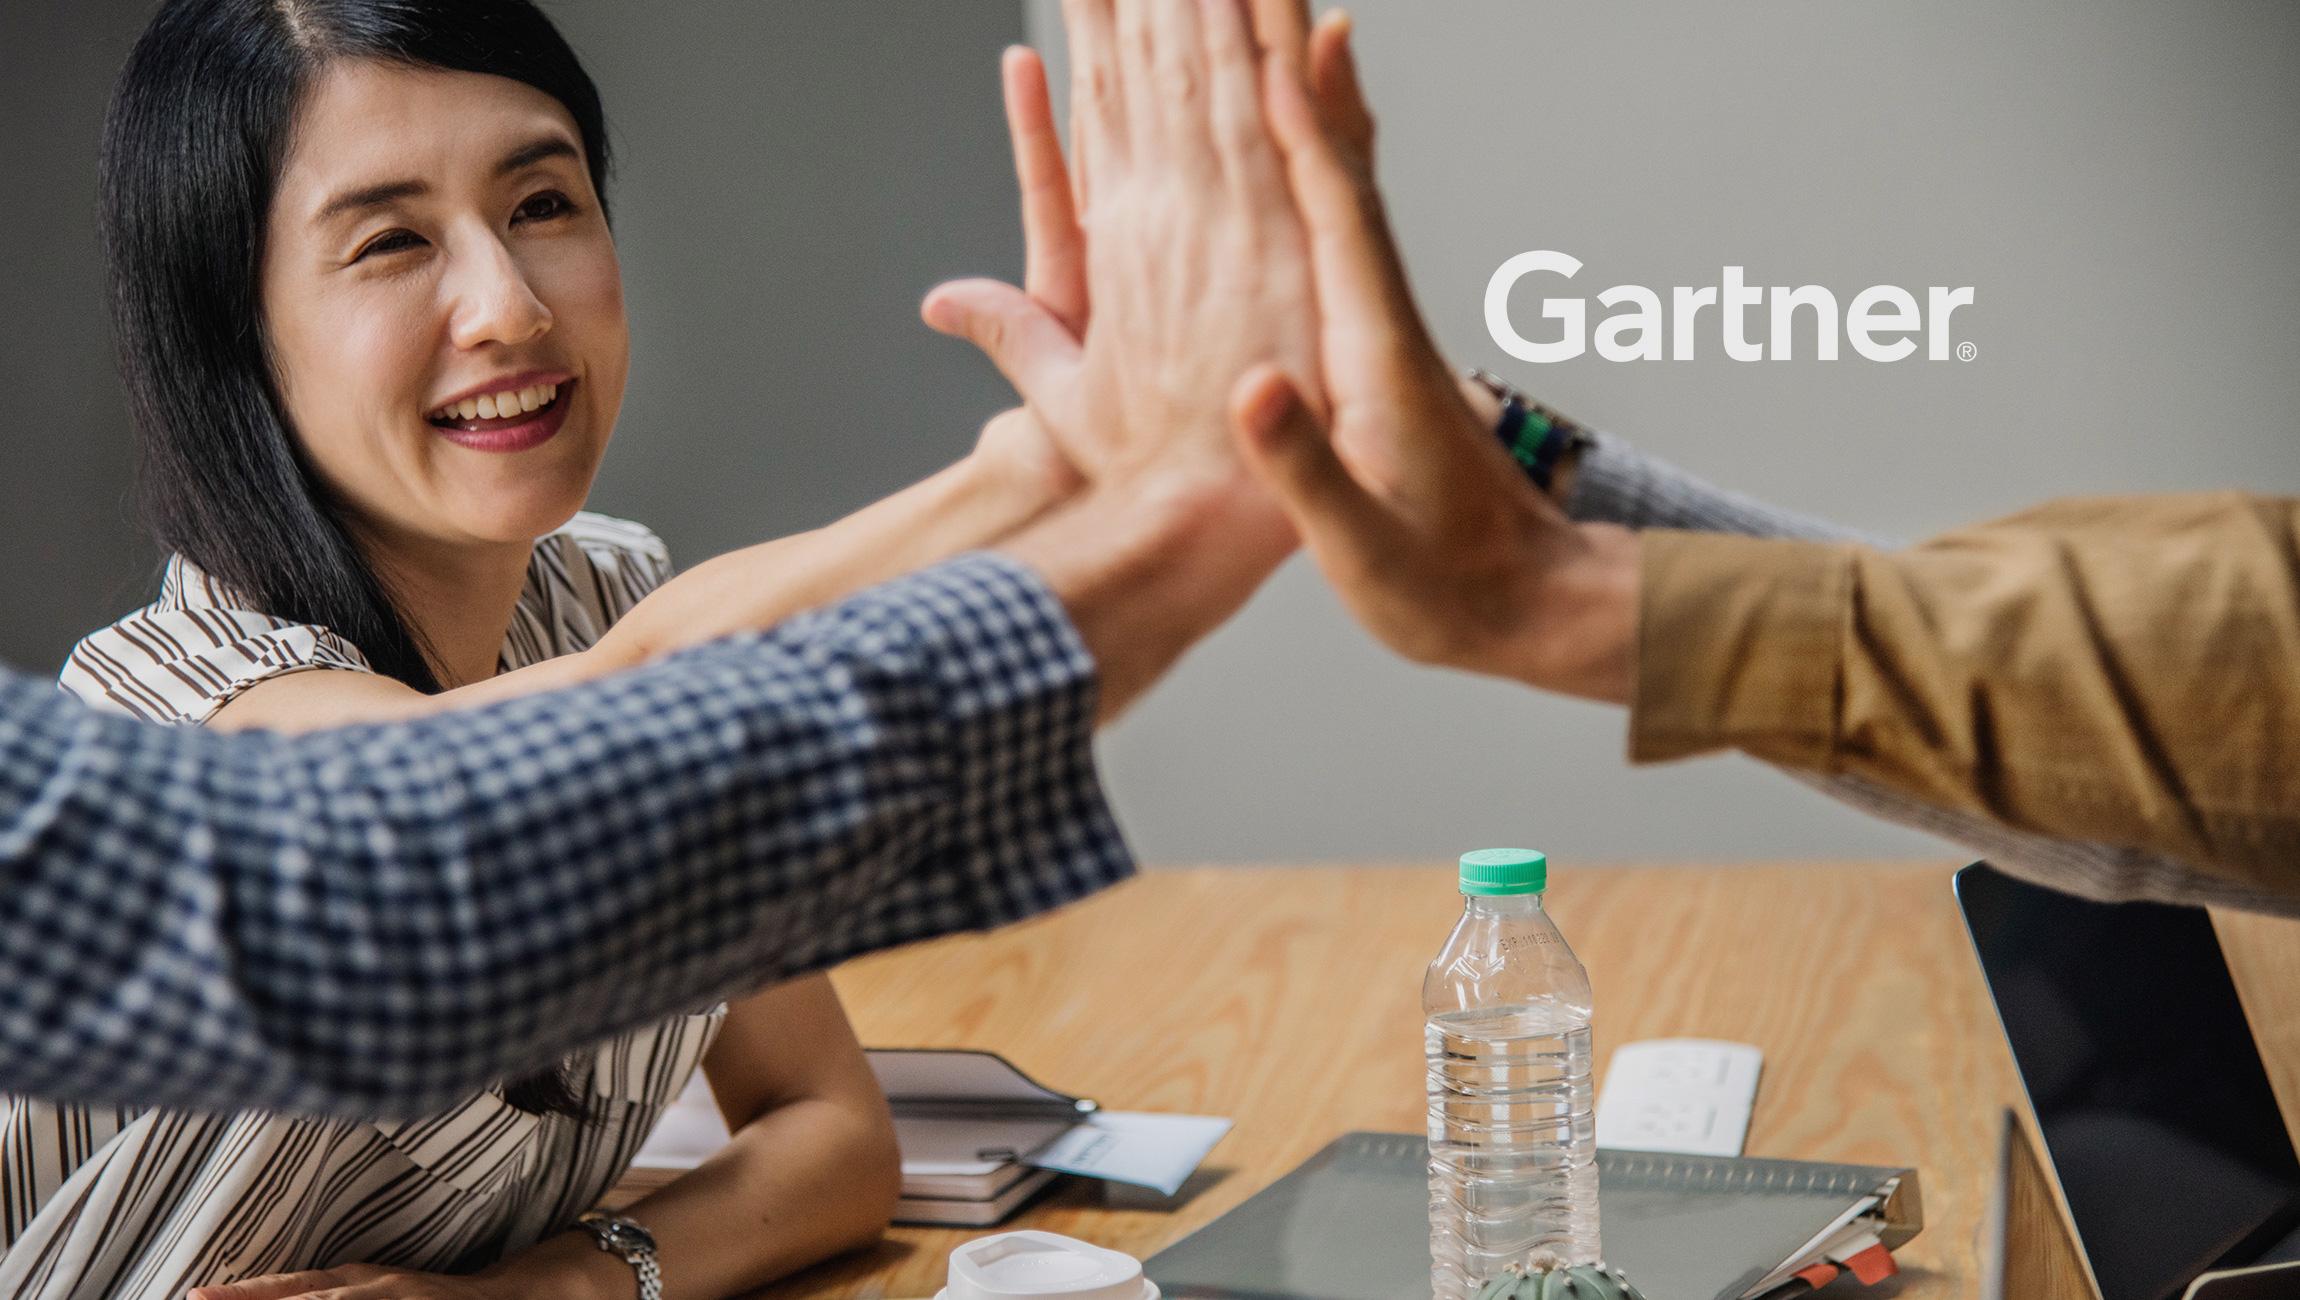 Gartner Says Global IT Spending to Reach $3.8 Trillion in 2019